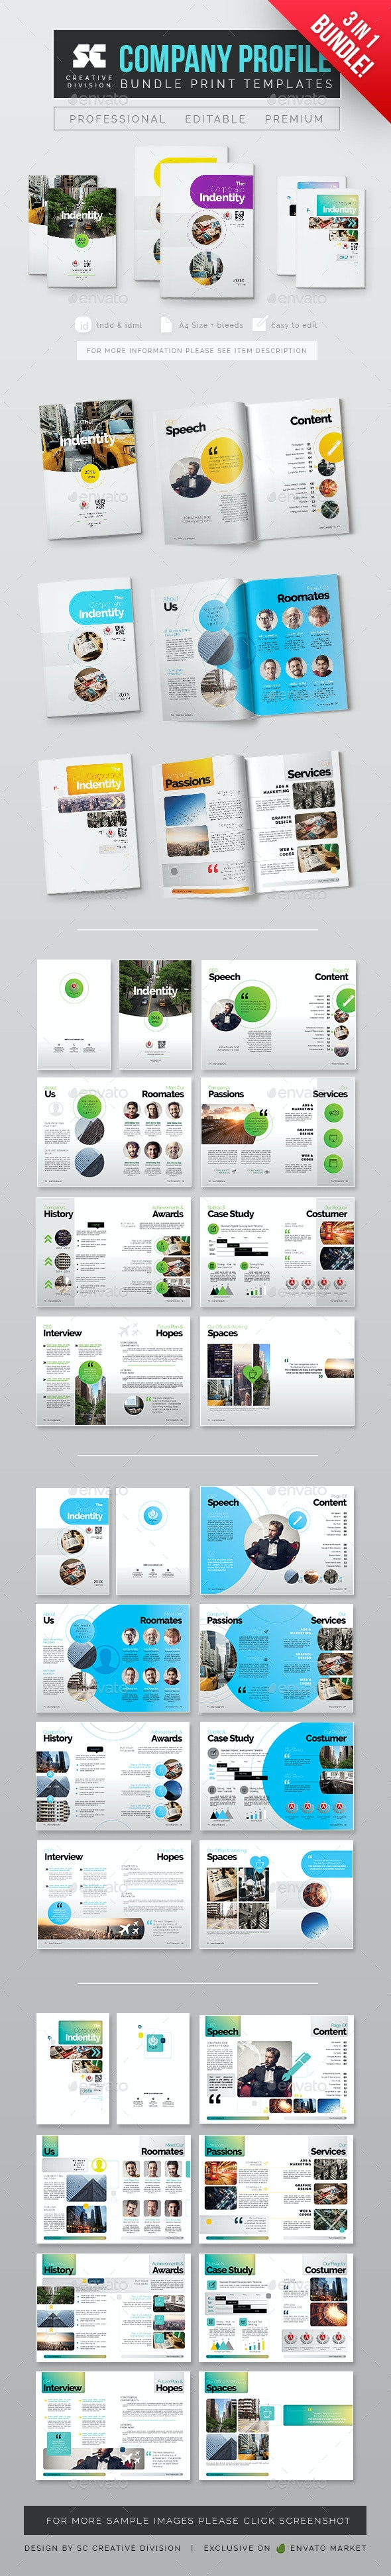 Company Profile Bundle 3 In 1 - Corporate Brochures